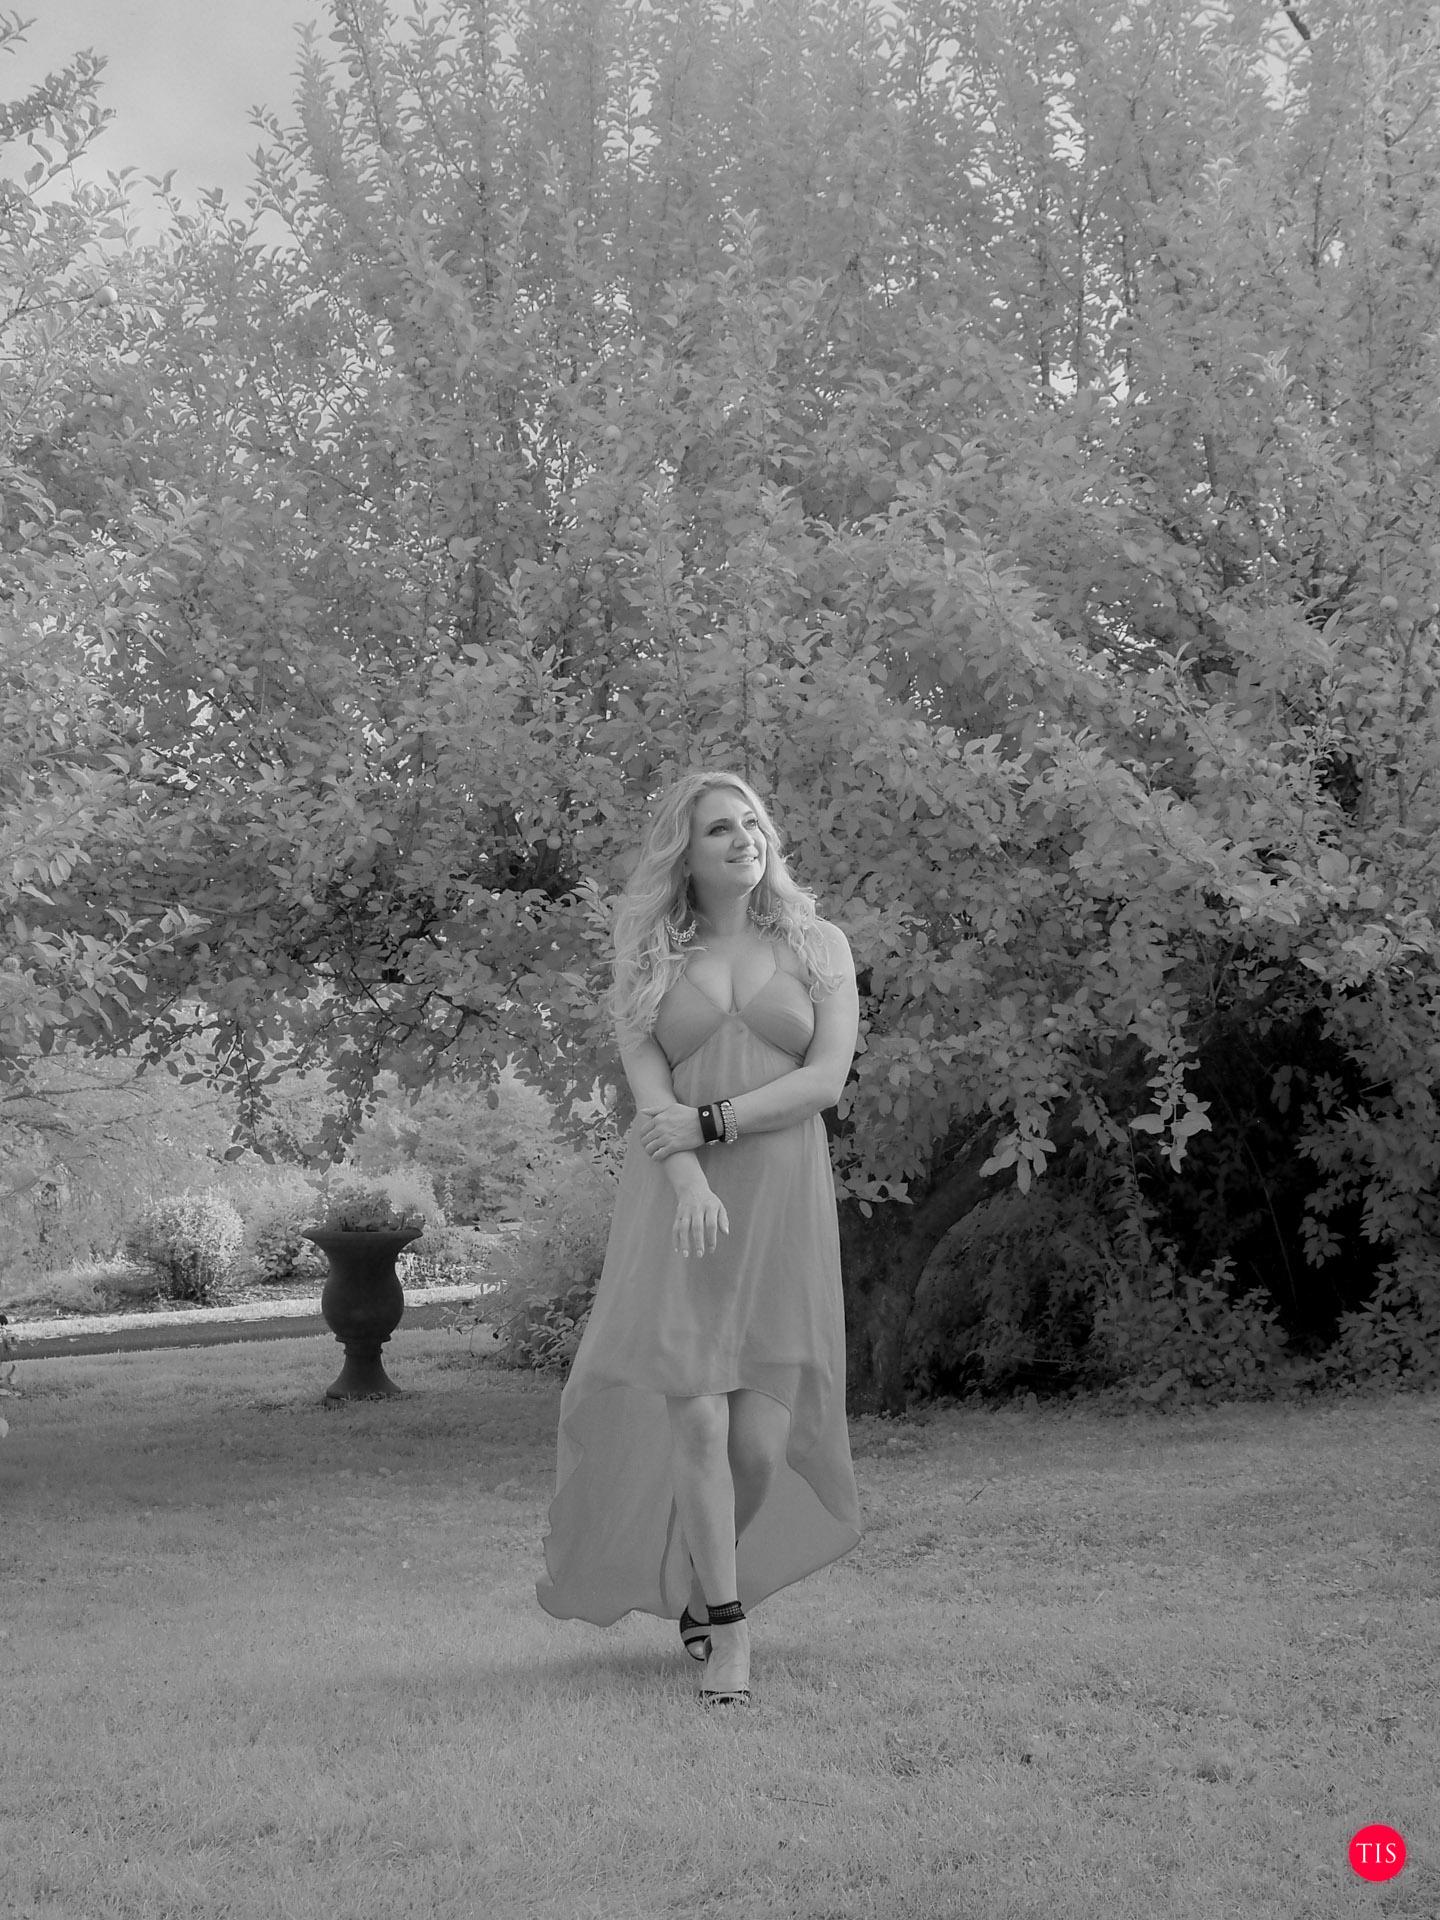 Dress by Express Shoes by Gwen Stefani